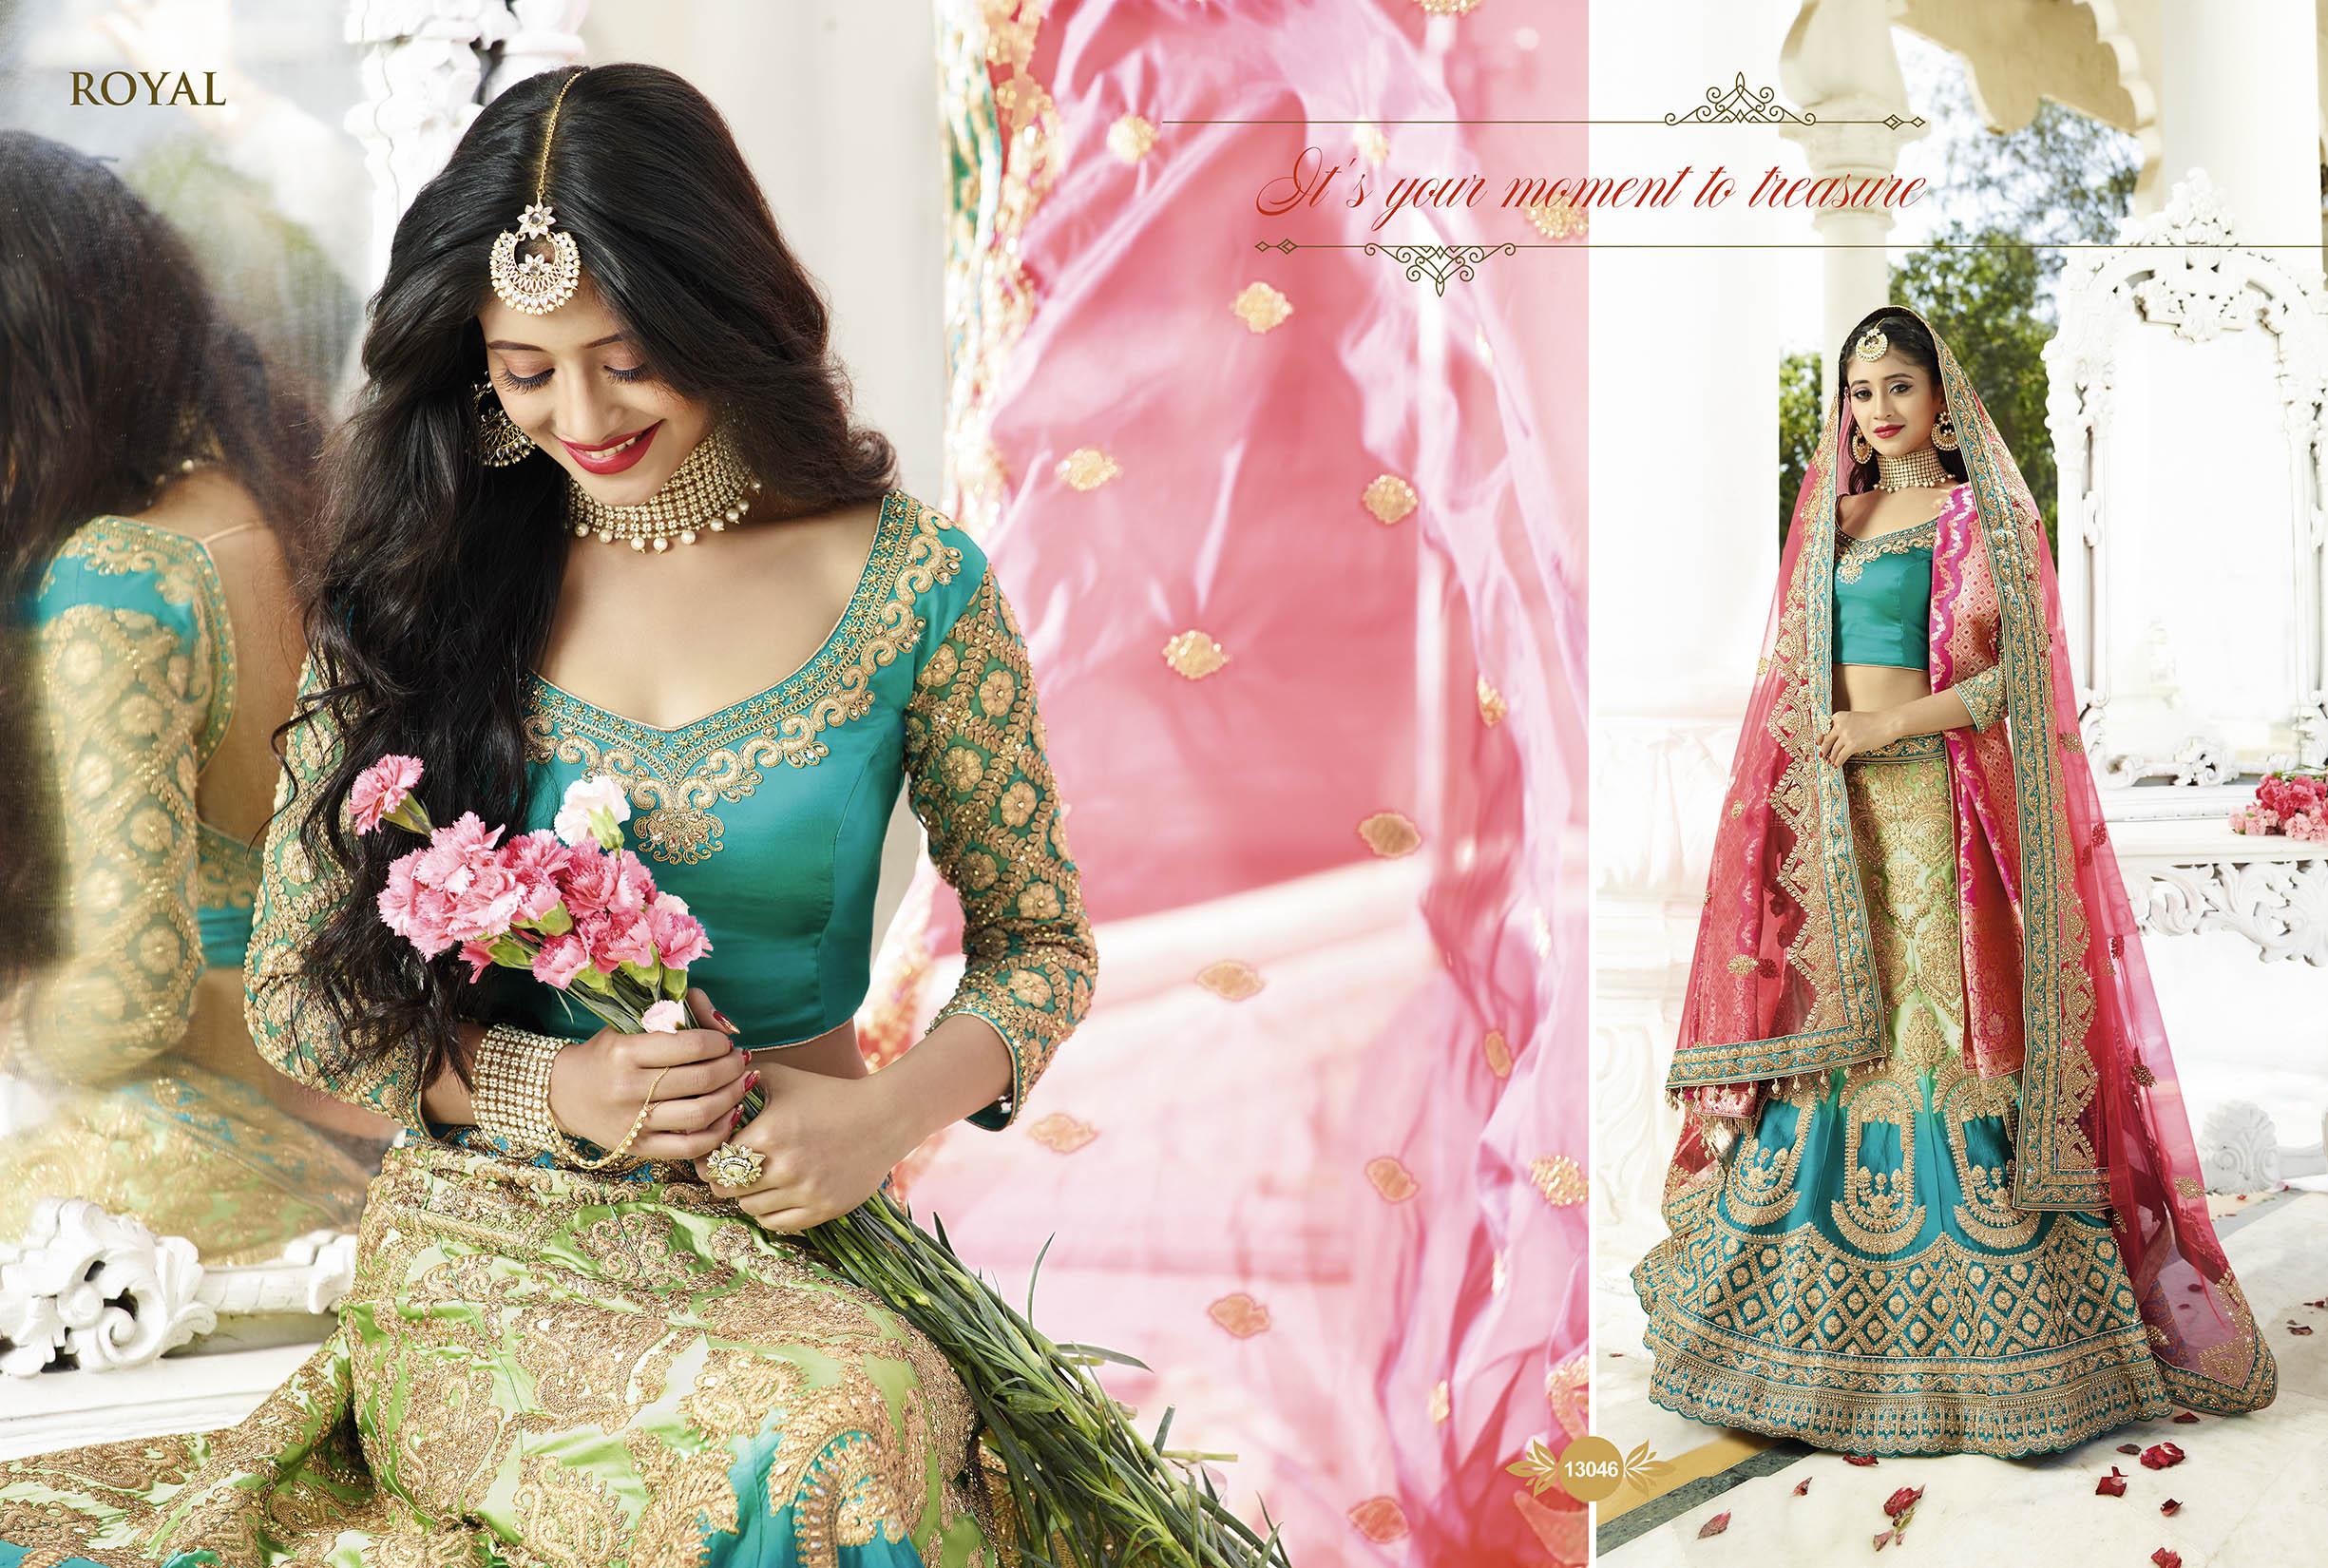 Royal Lehenga choli for wedding 13046 | Indian Bridal Wear